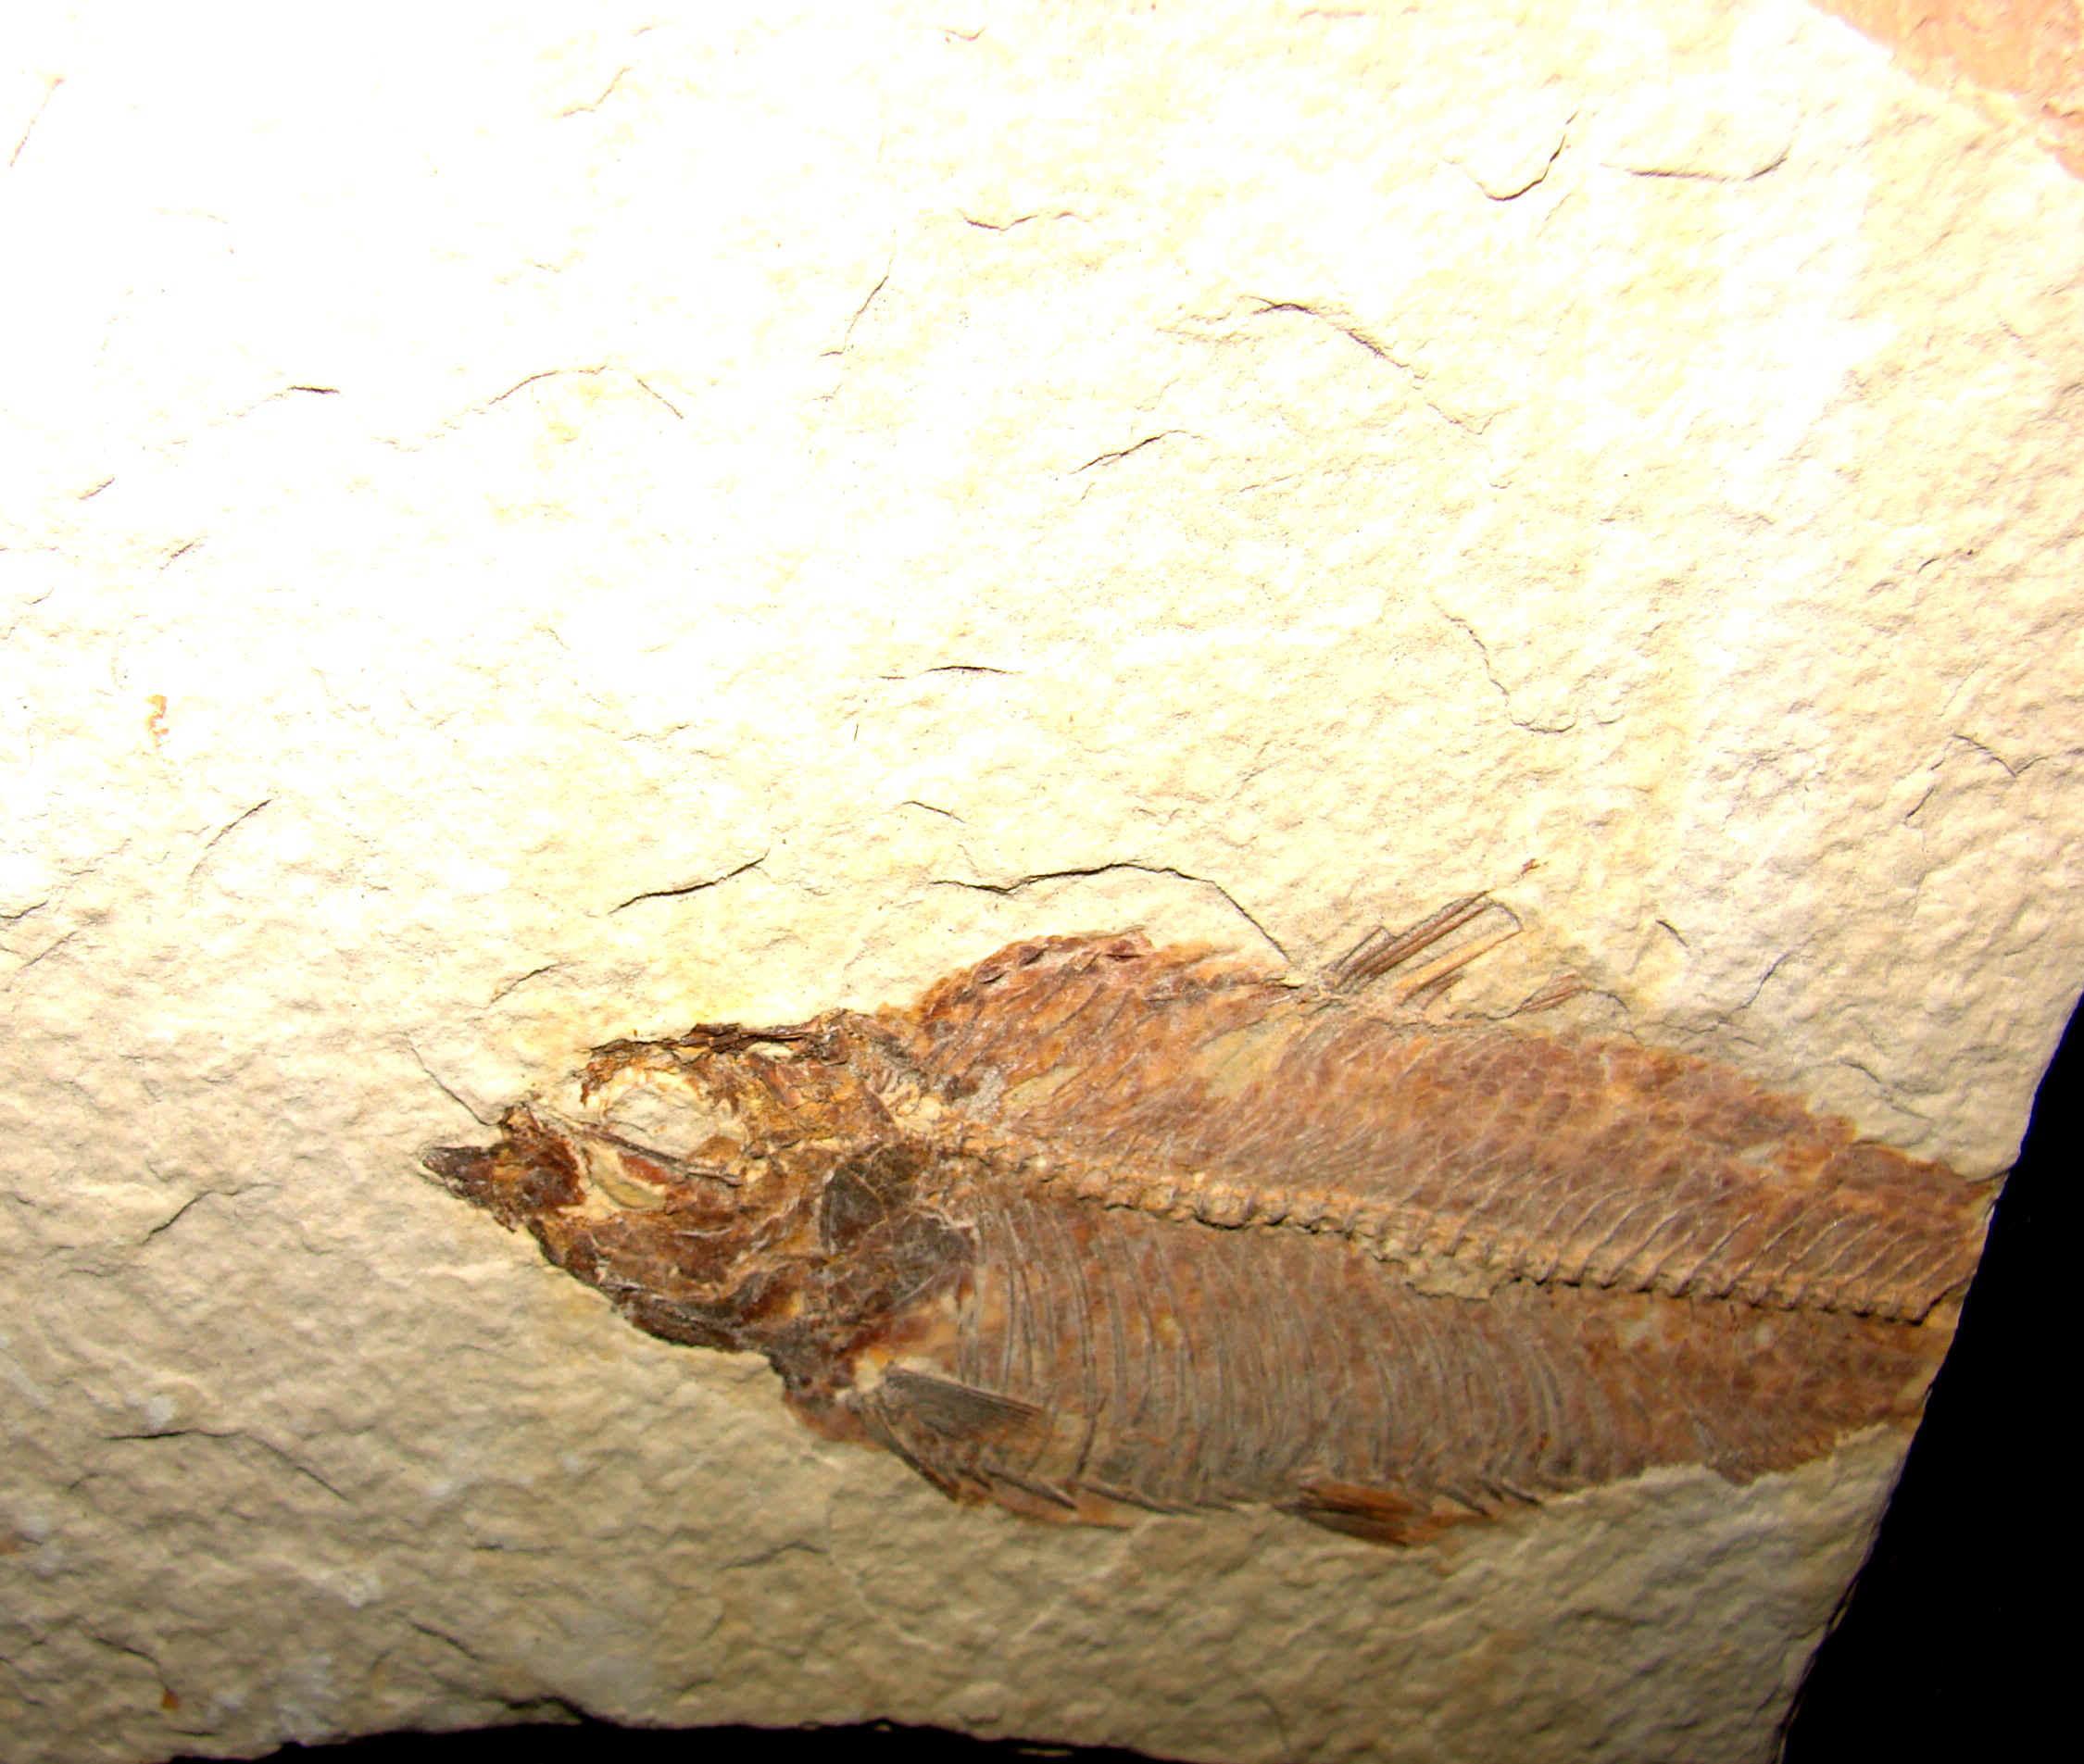 http://www.artfromgod.com/fossilfish-36.jpg (807370 bytes)